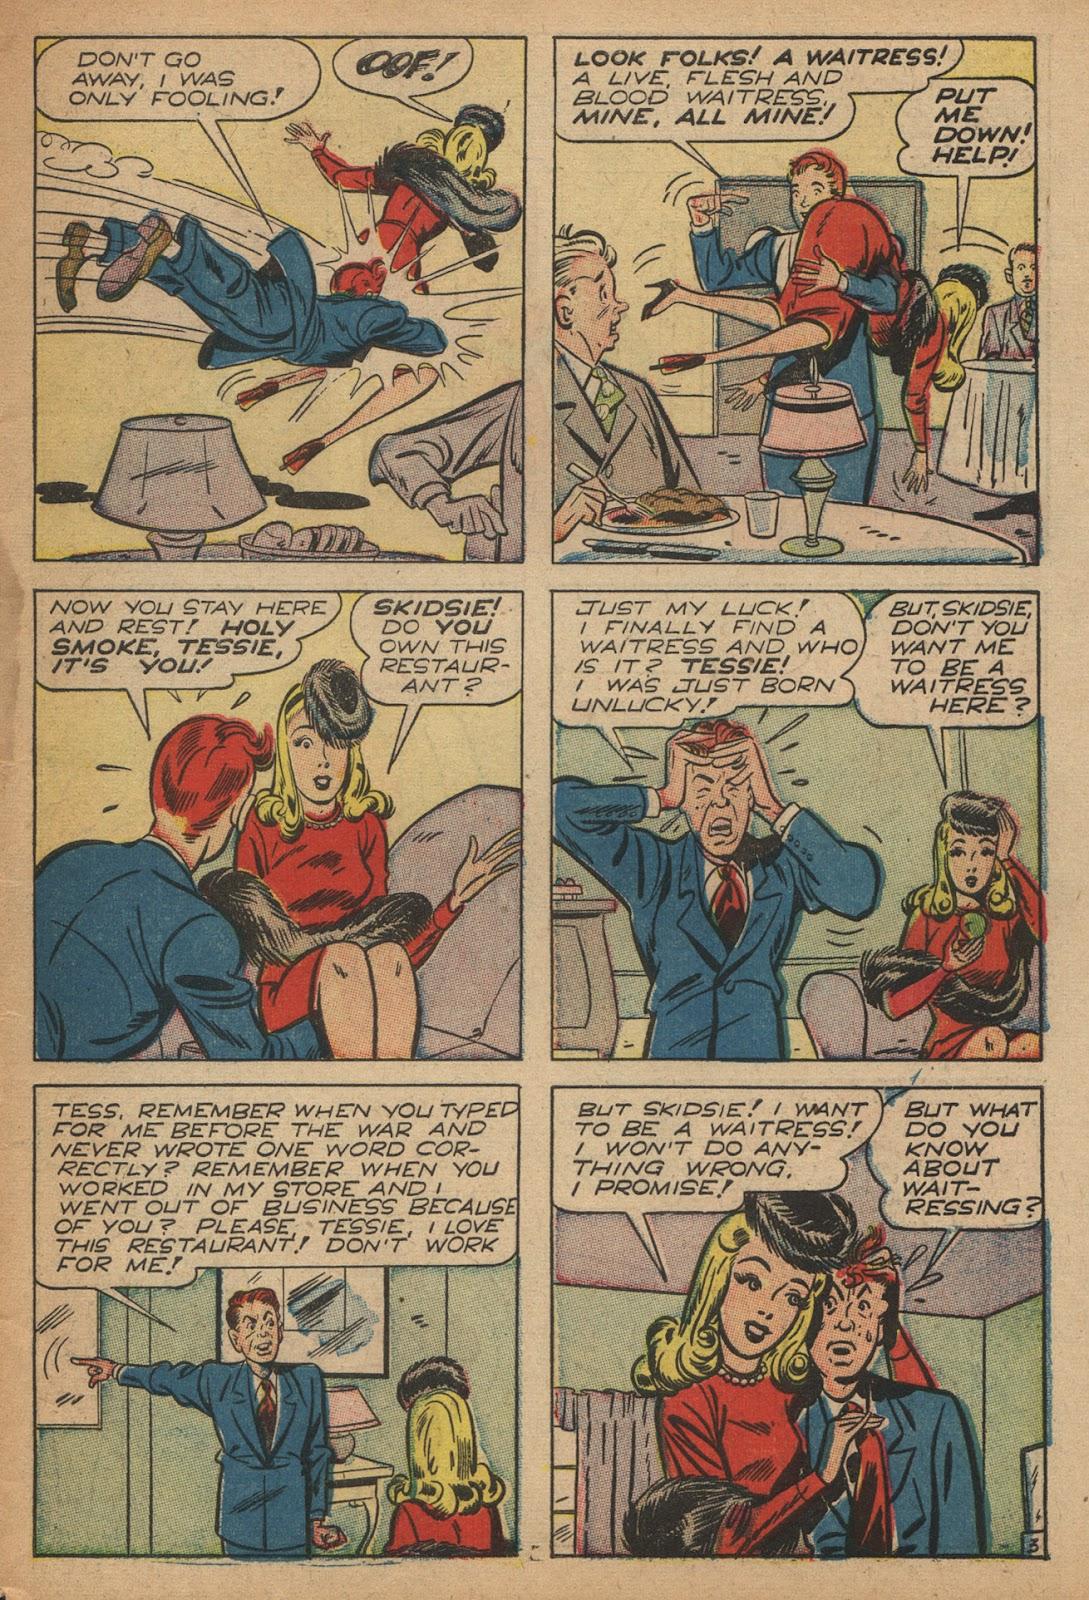 Read online Gay Comics comic -  Issue #23 - 5